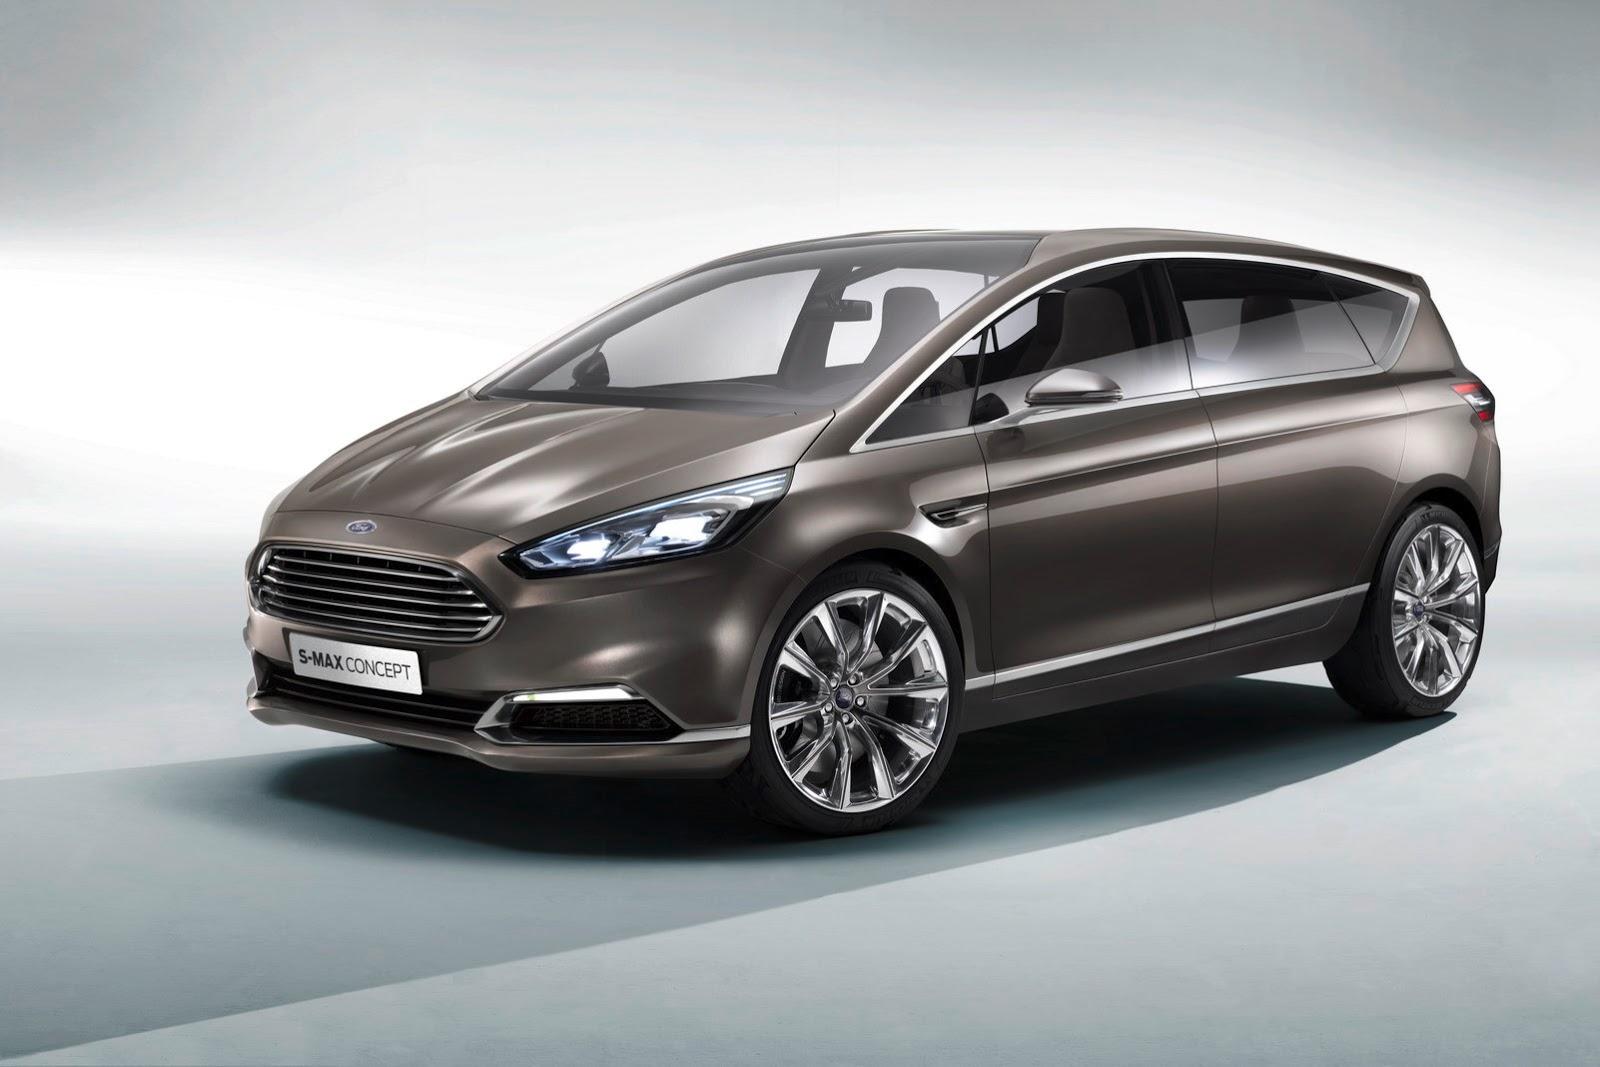 Ford s max concept 9 25255b2 25255d jpg